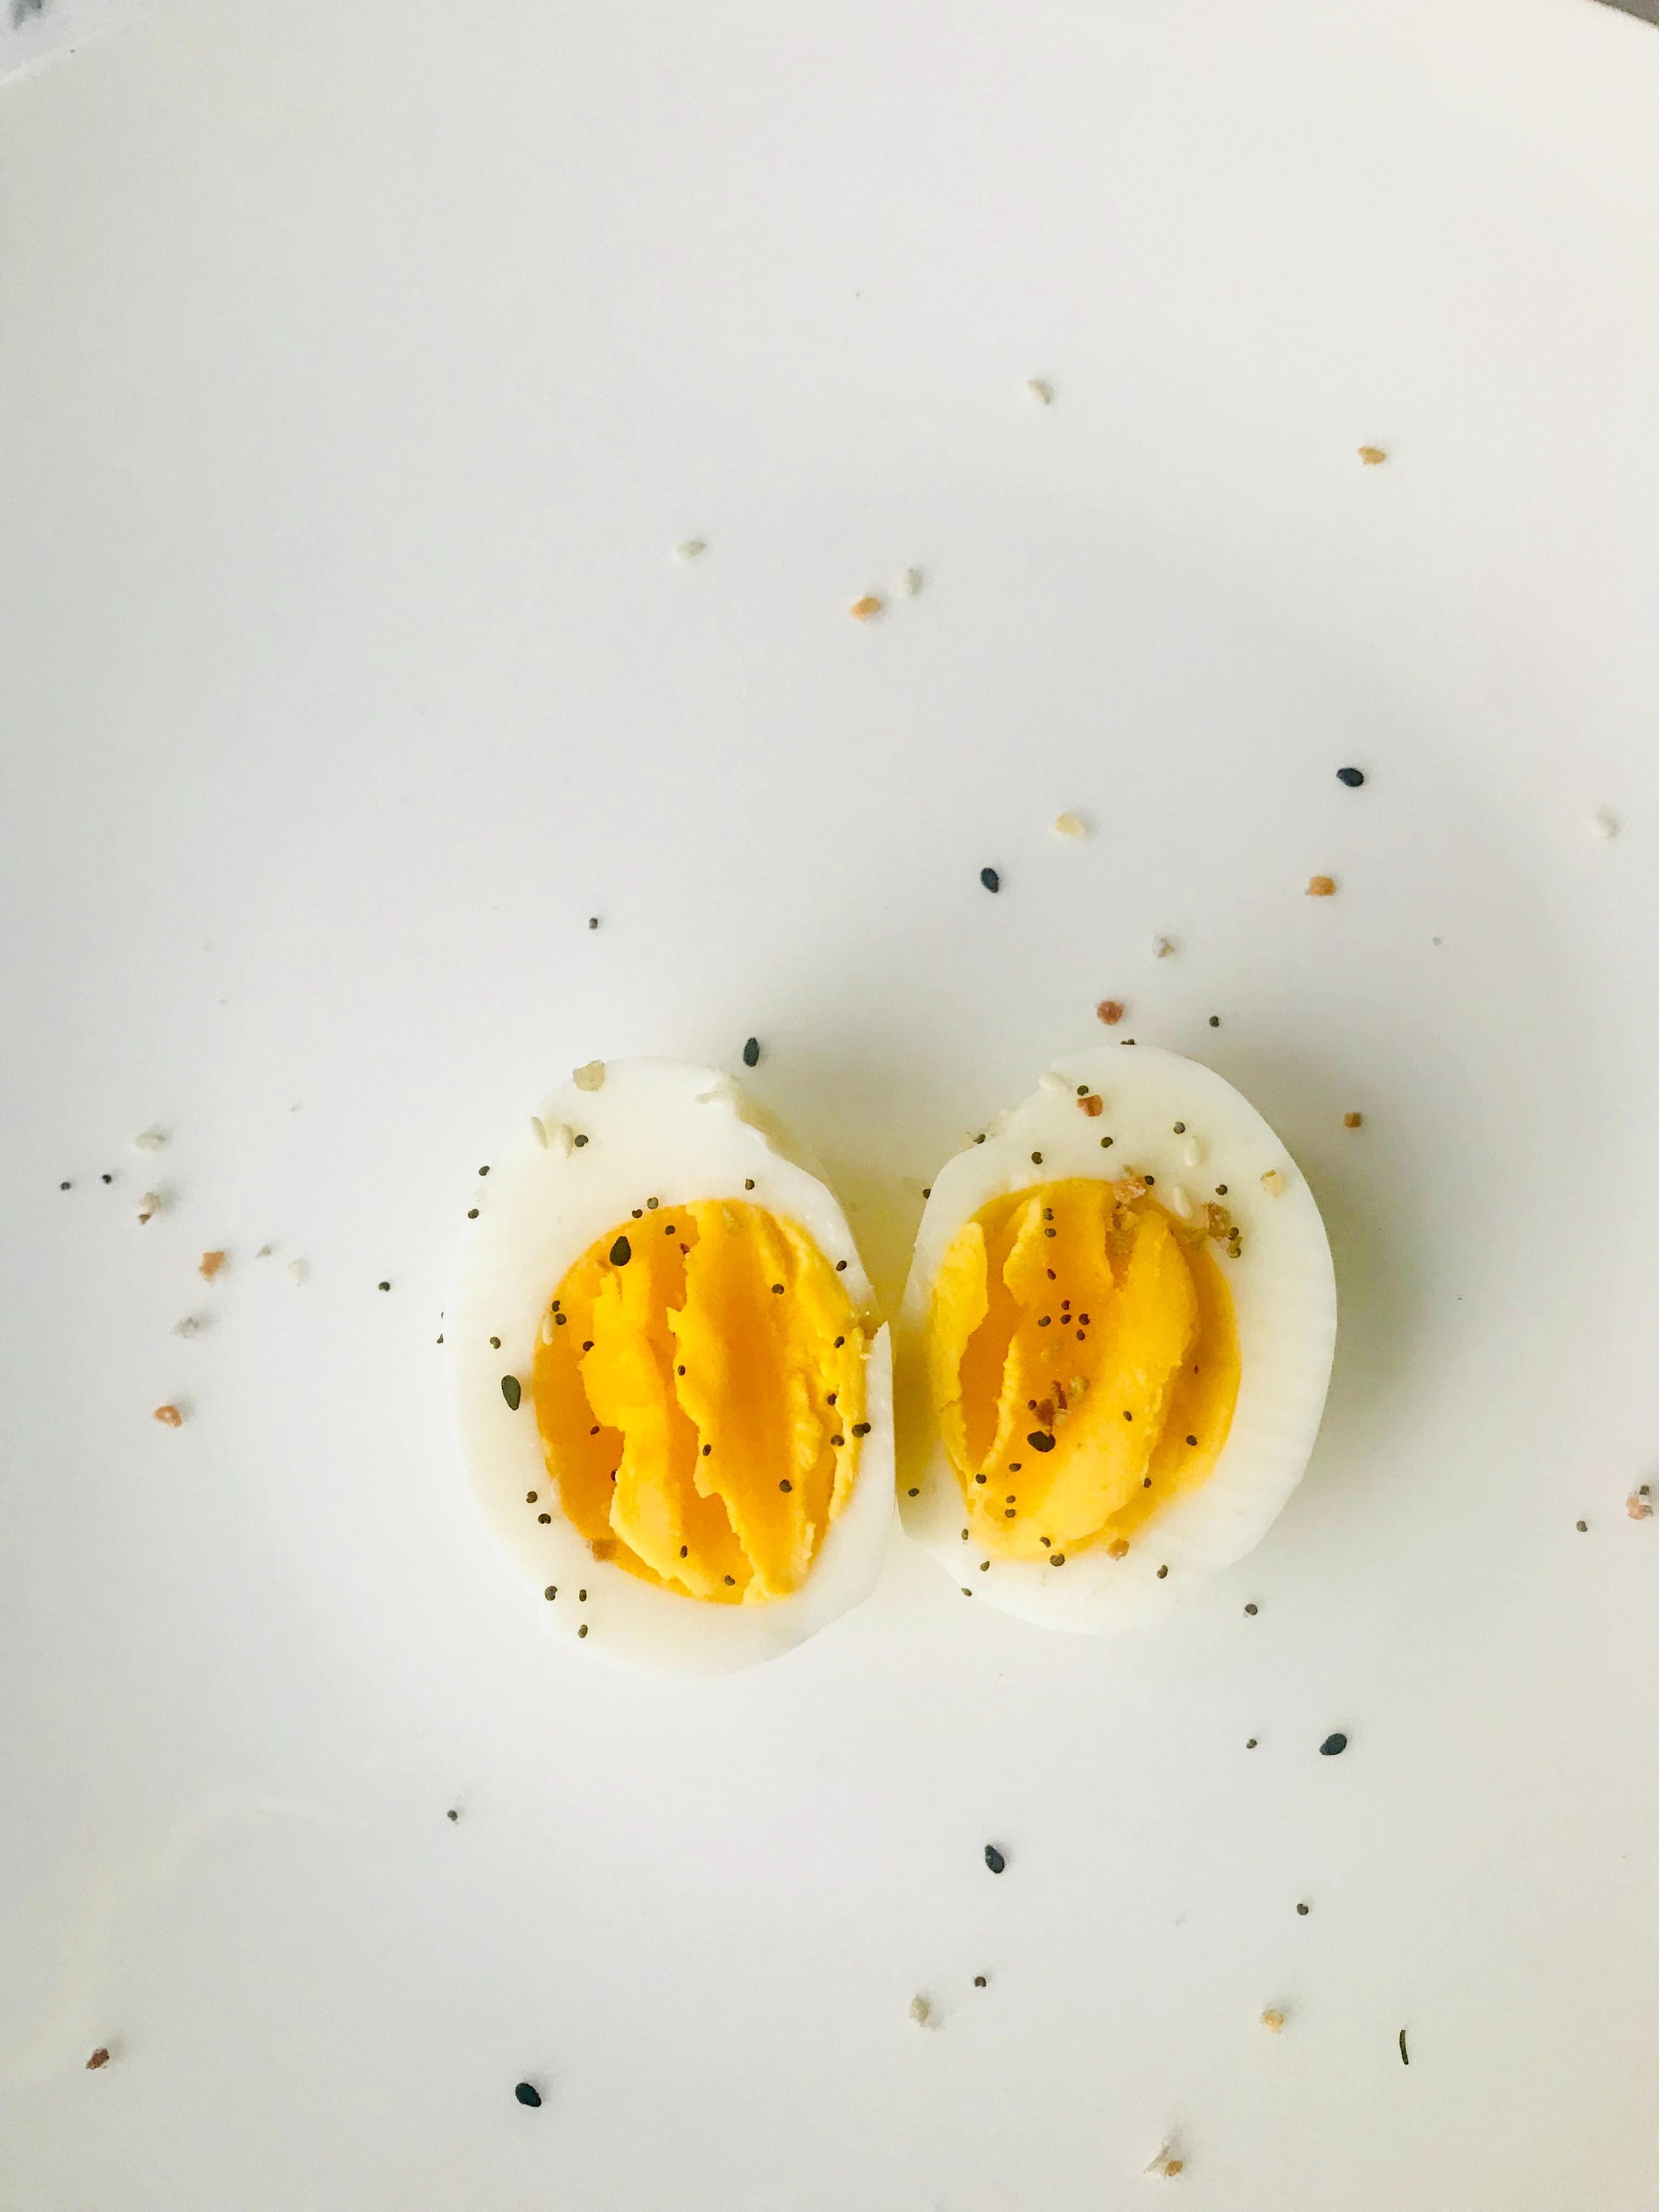 Sliced Boiled Egg on White Plate, Boiled egg, Nutritious, Traditional, Tasty, HQ Photo